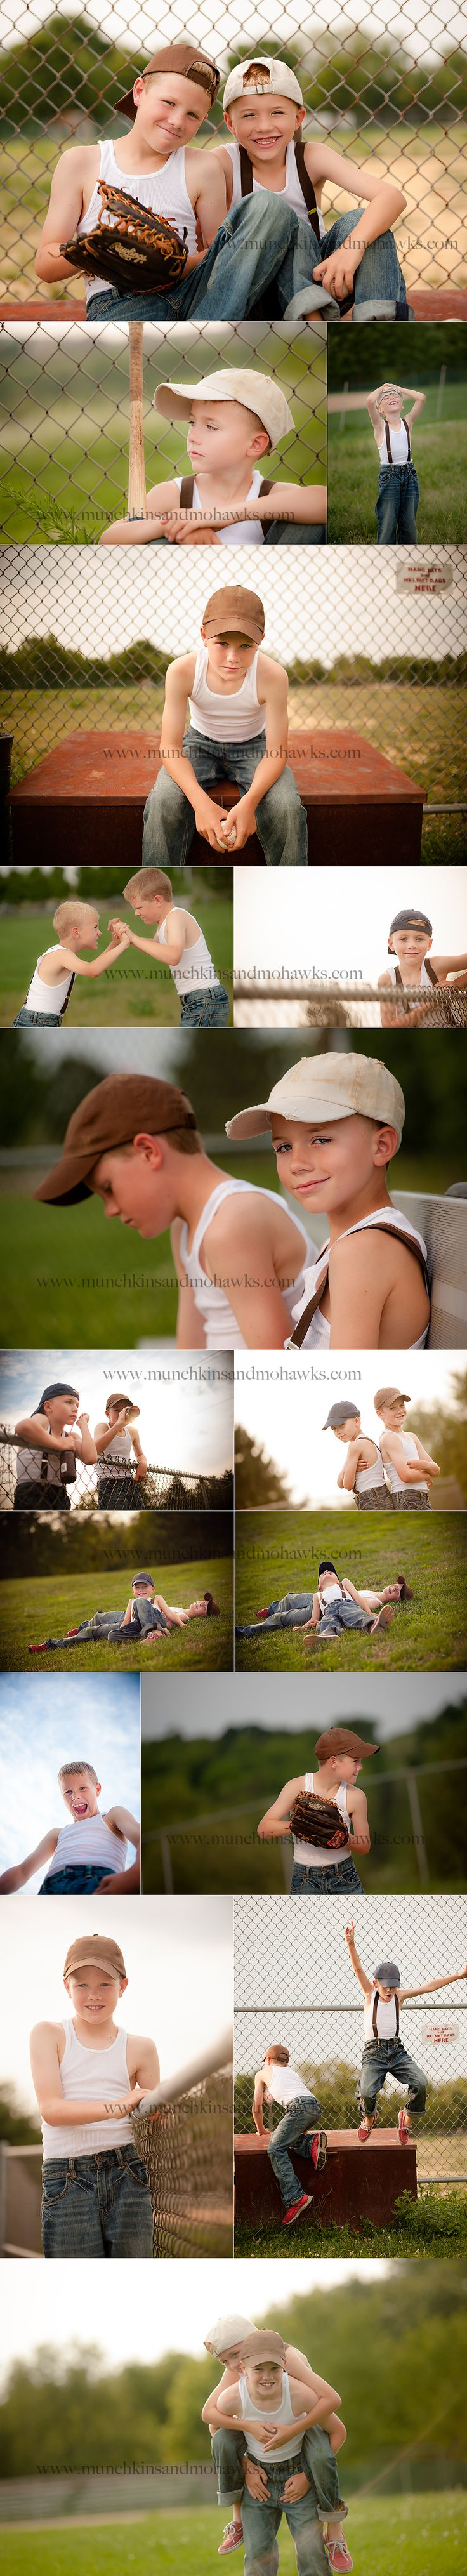 Love this shoot by Tiffany at Munchkins and Mohawks! baseball tween boys www.munchkinsandmohawks.com/blog